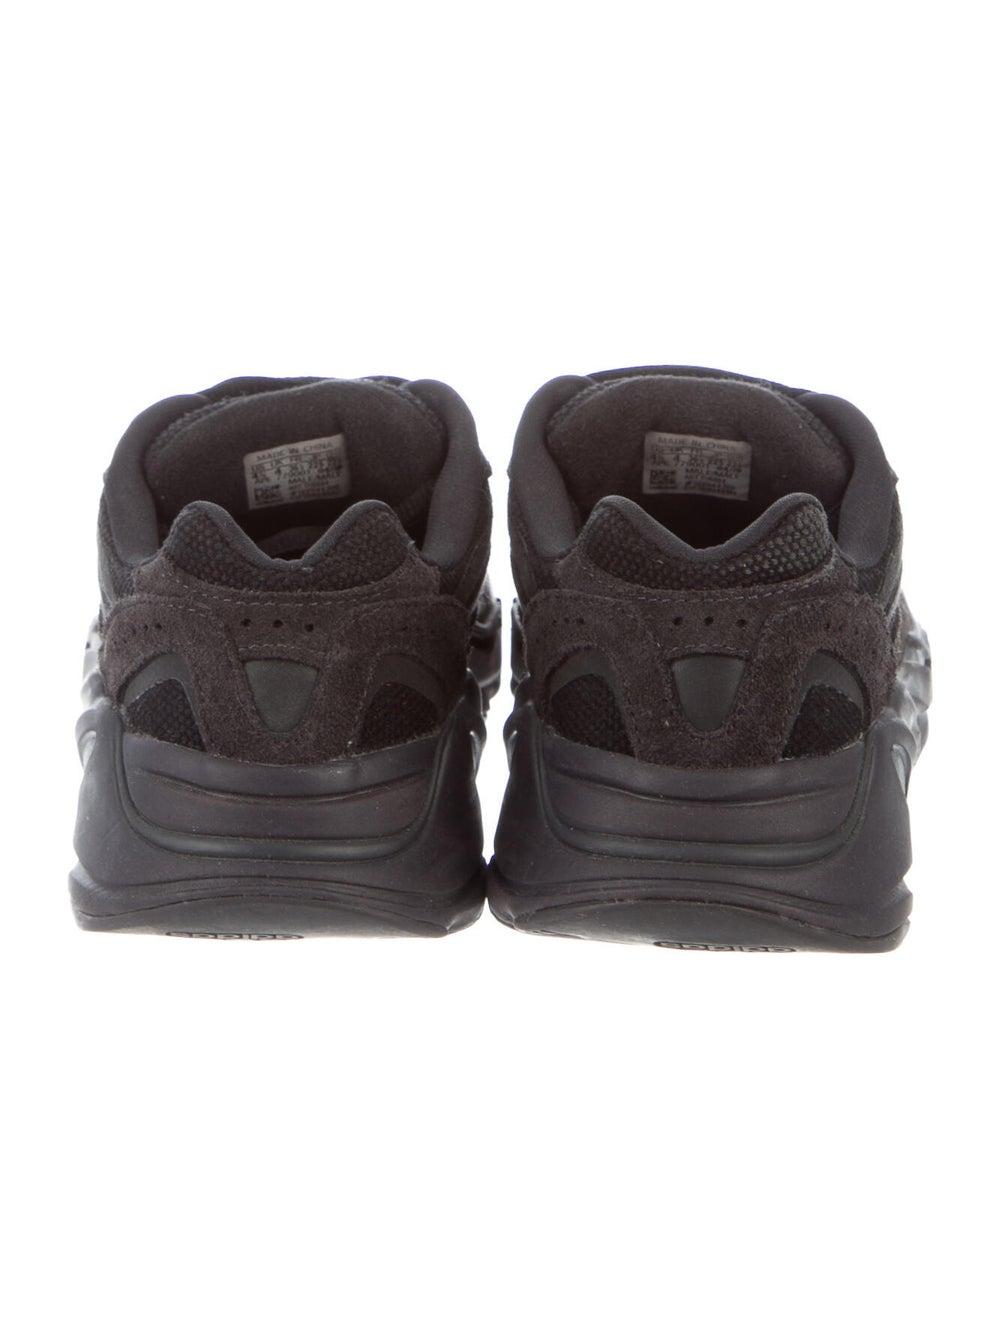 Yeezy x adidas 2019 Boost 700 V2 Vanta Sneakers S… - image 4